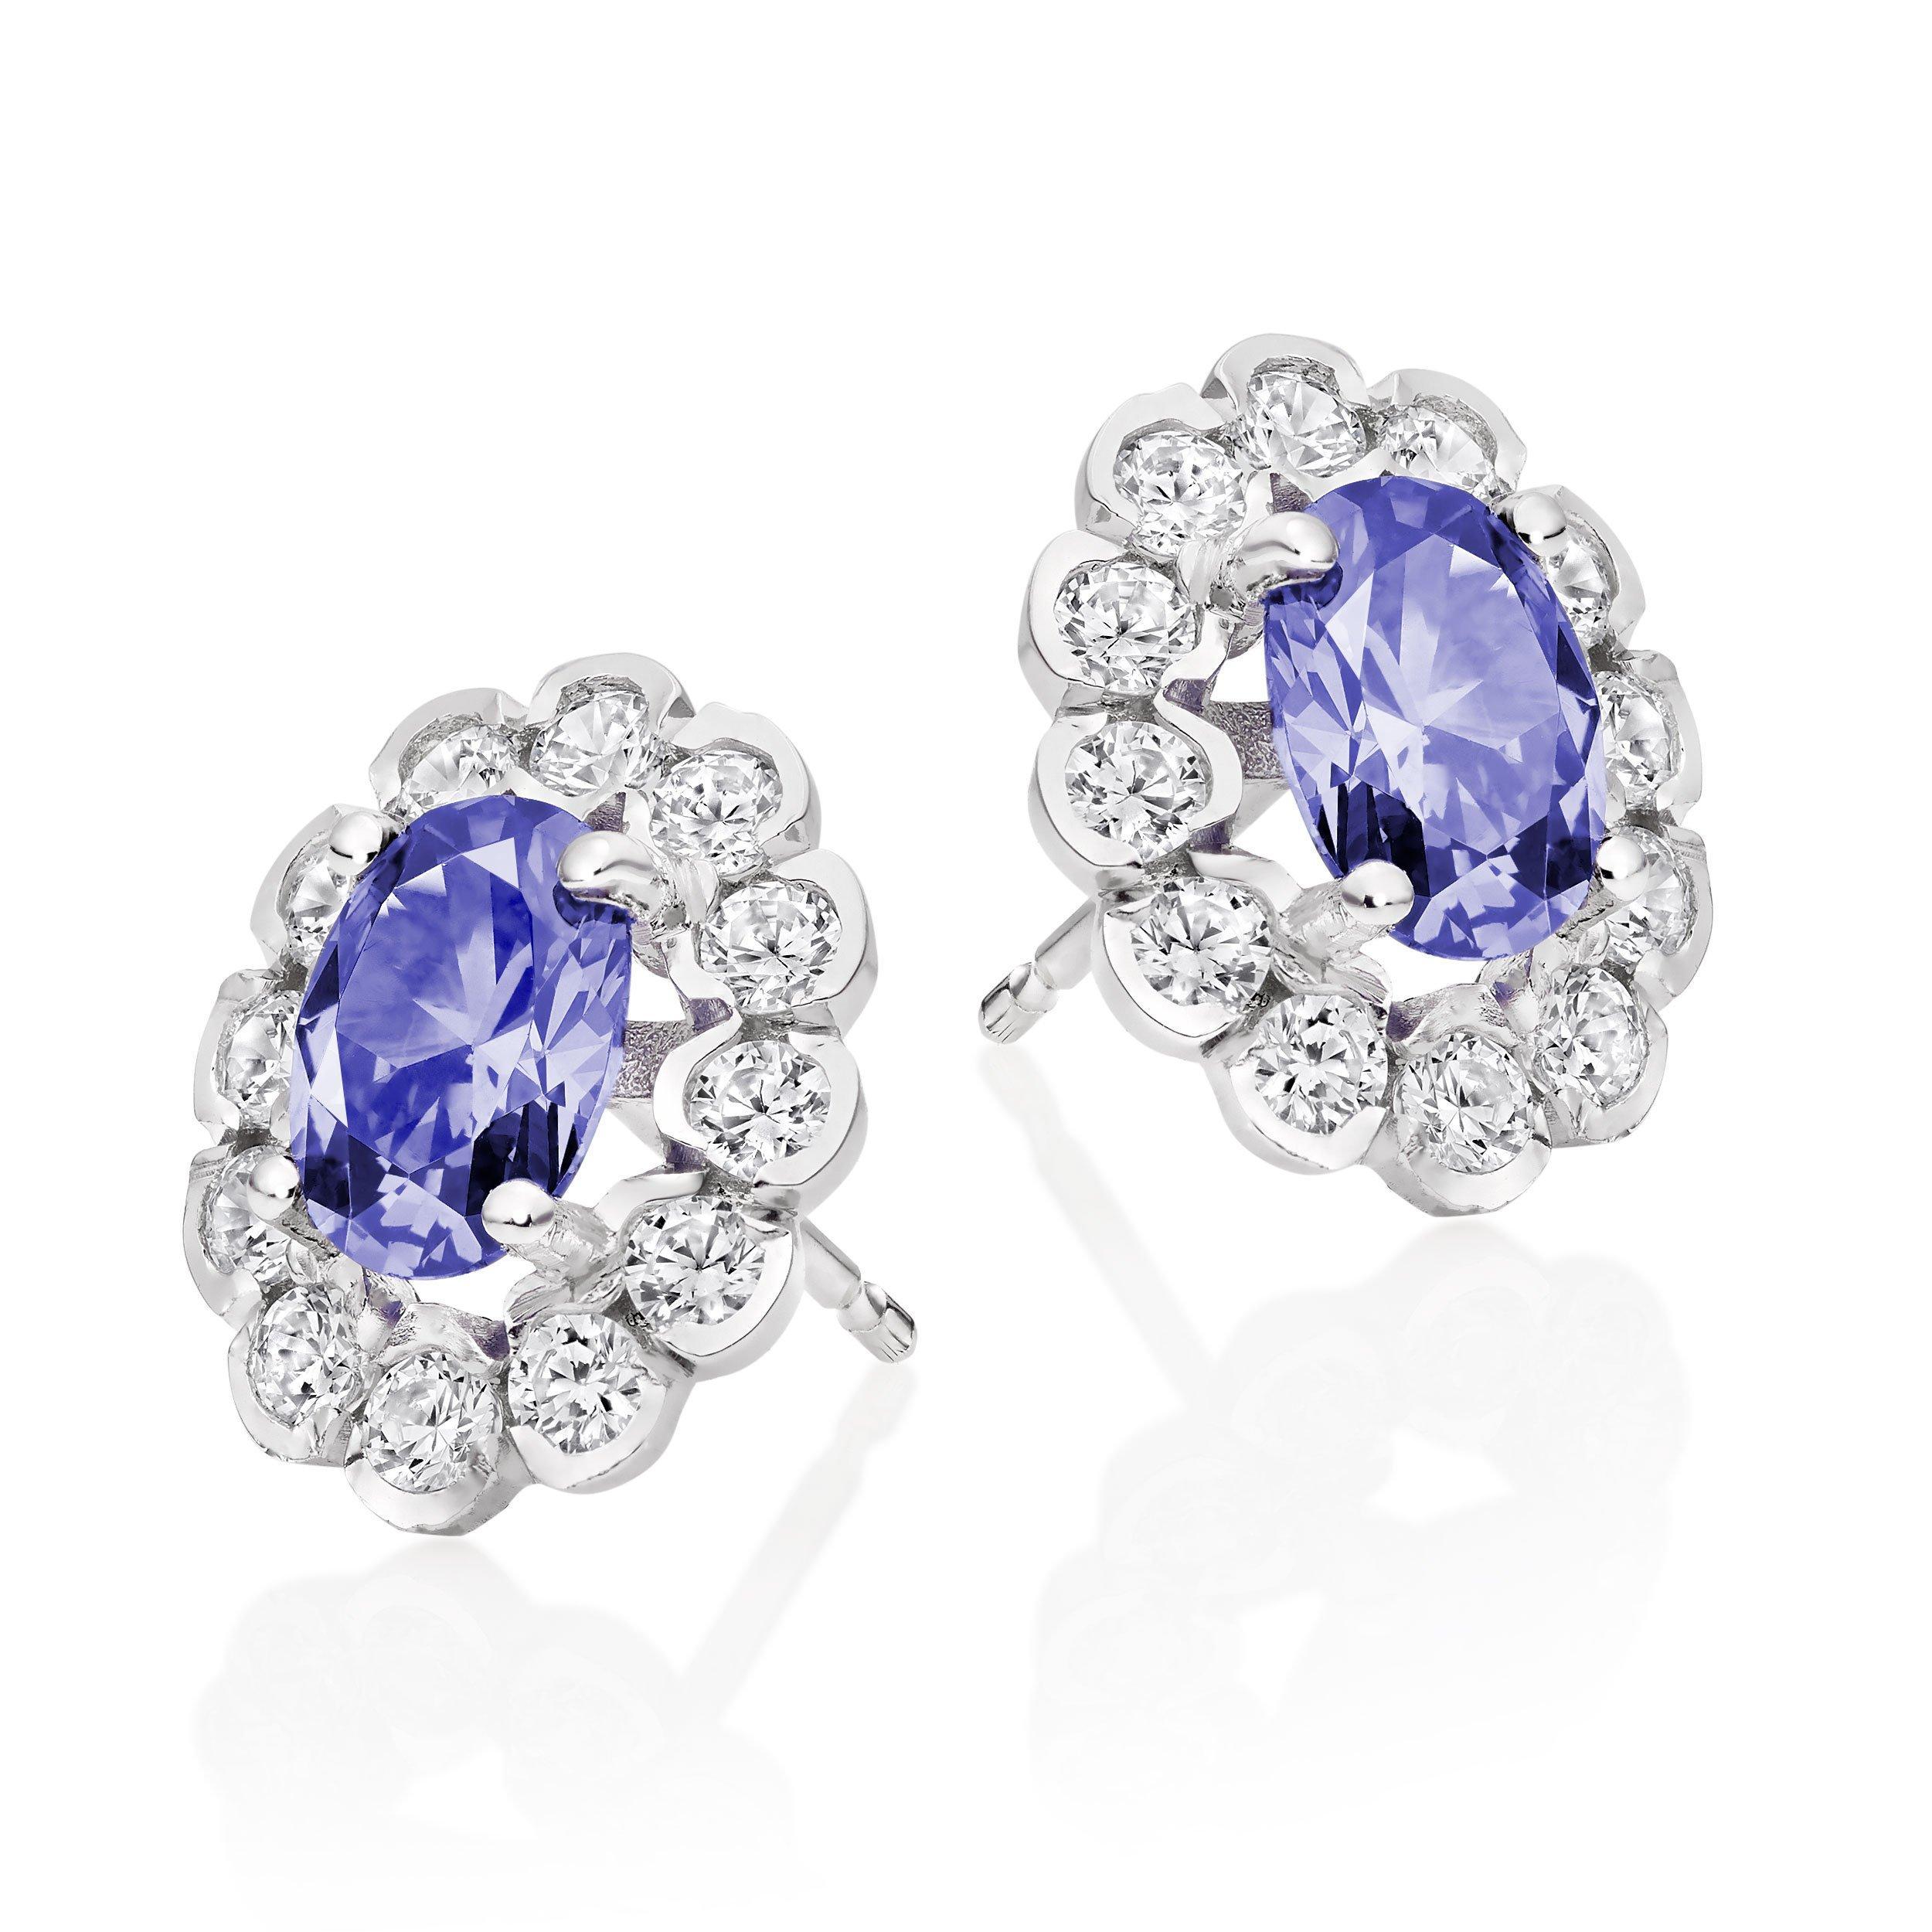 9ct White Gold Purple Cubic Zirconia Stud Earrings